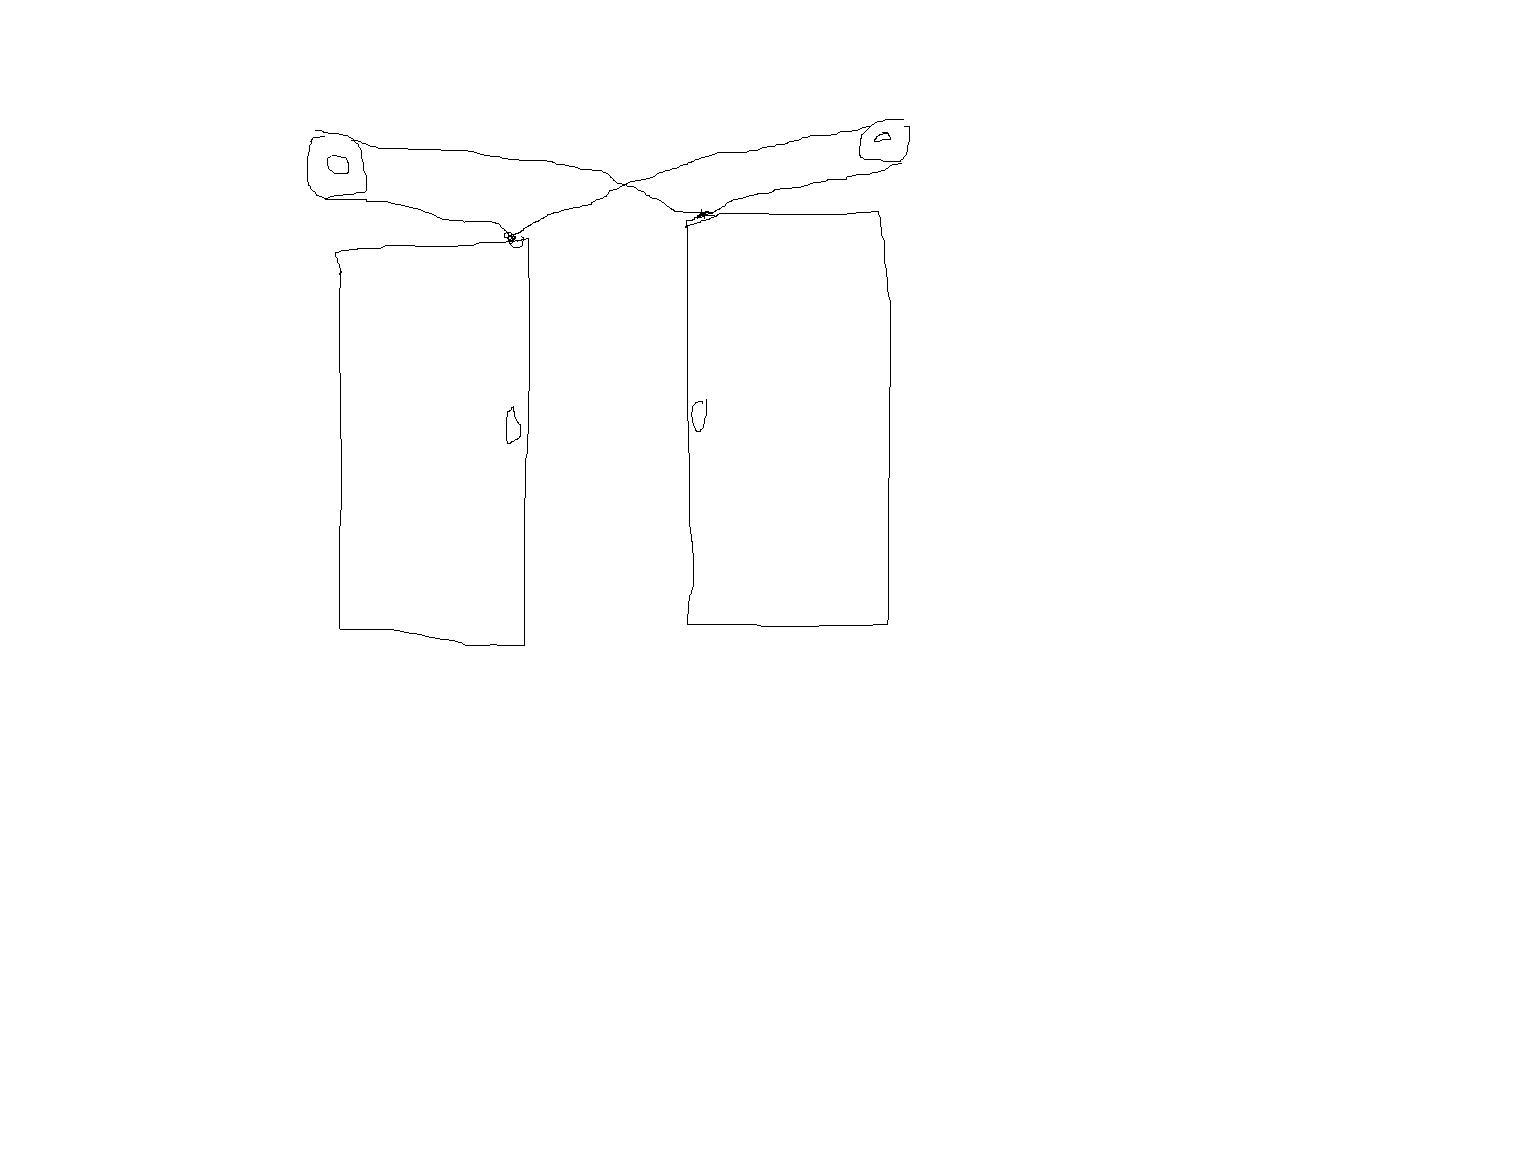 Converging Pocket Door Linkage Kit Any Drawings Carpentry